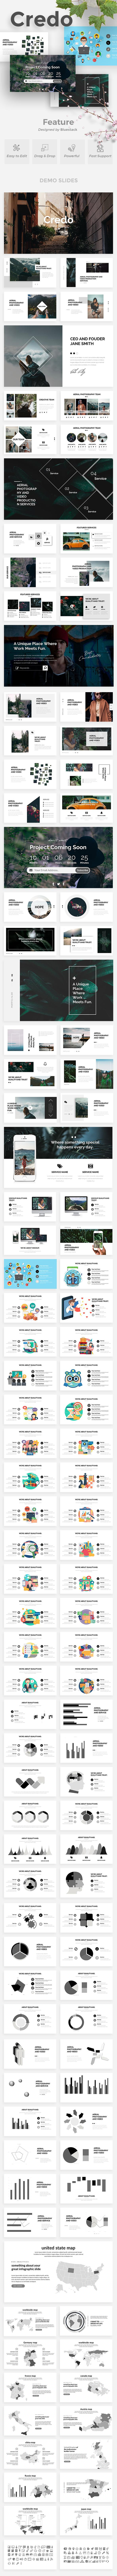 Credo Creative Google Slide Template - Google Slides Presentation Templates